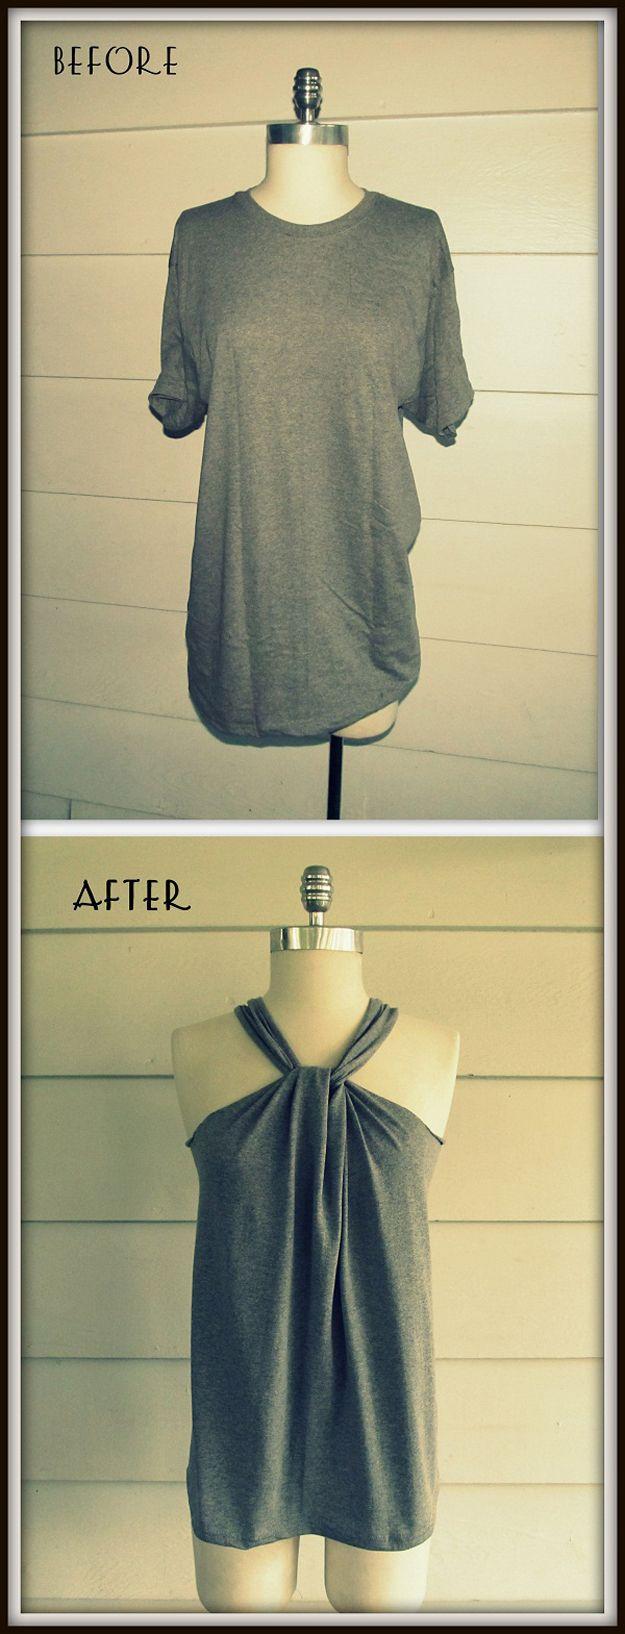 No Sew Tee-Shirt Halter | Easy Haltered DIY Top Design by DIY Ready at diyready.com/diy-clothes-sewing-blouses-tutorial/